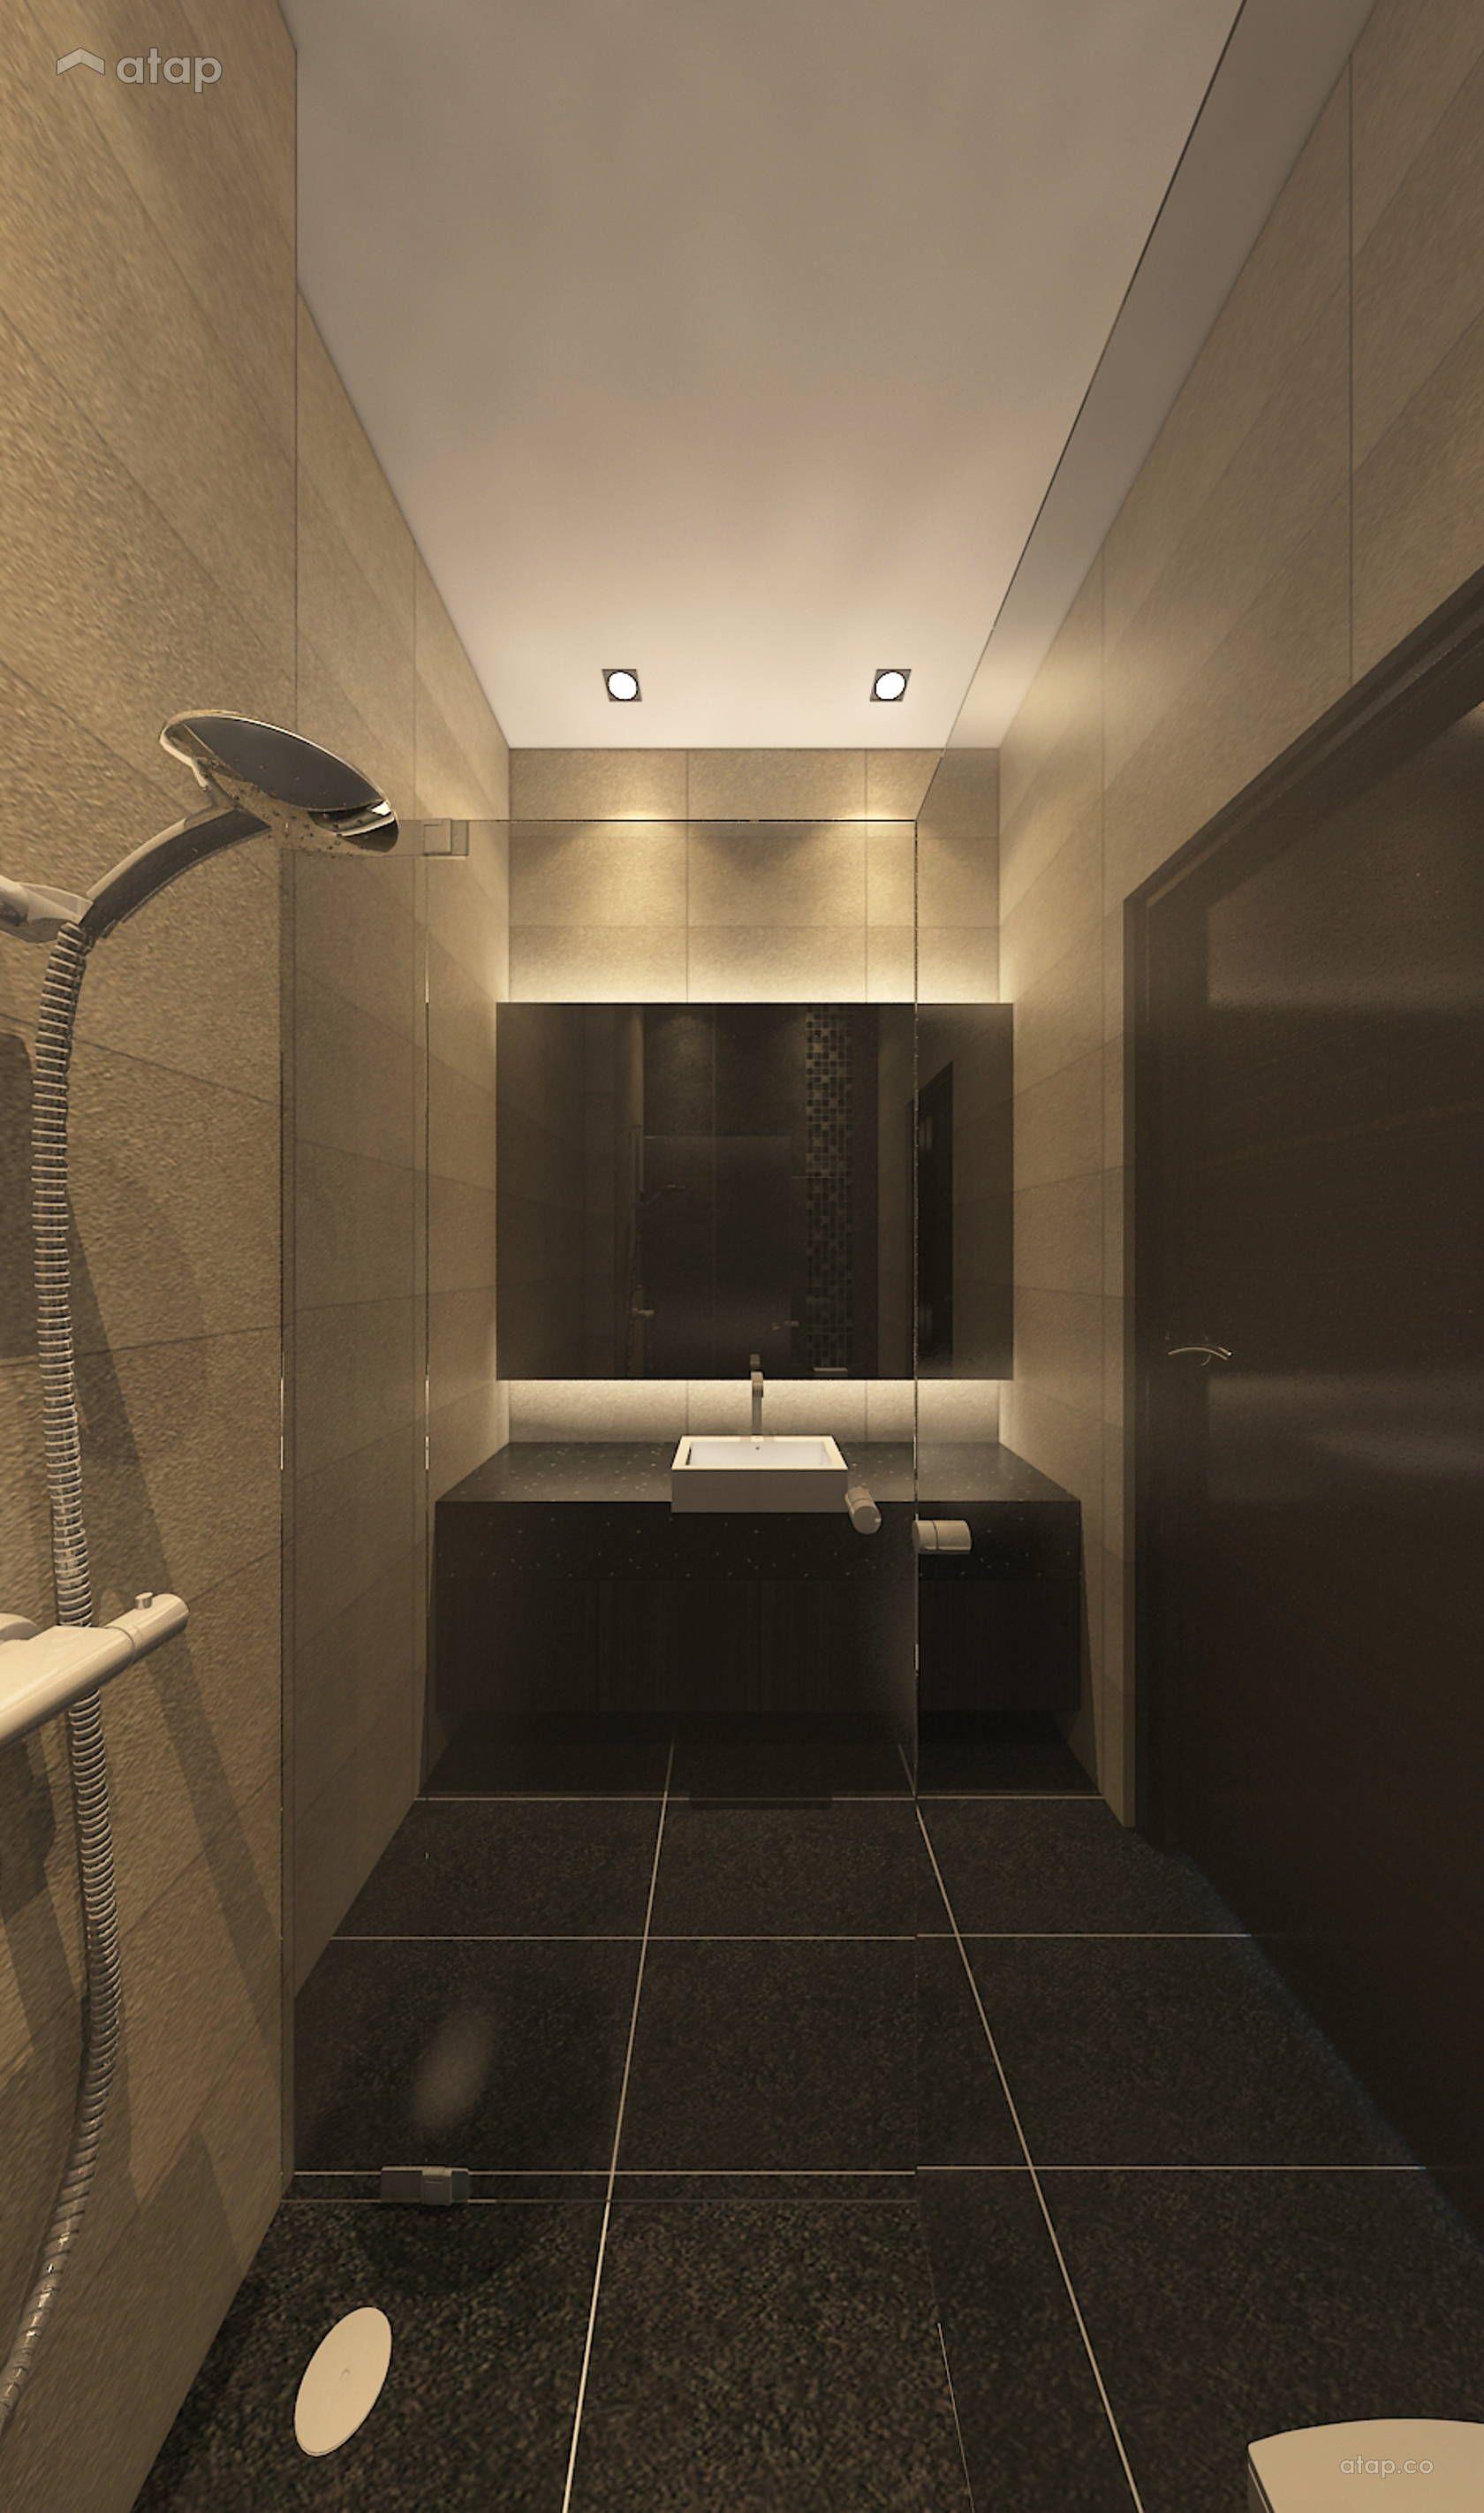 Vintage Bathroom Apartment Design Ideas Photos Malaysia Atap Co Vintage Bathroom Apartment Design Apartment Projects